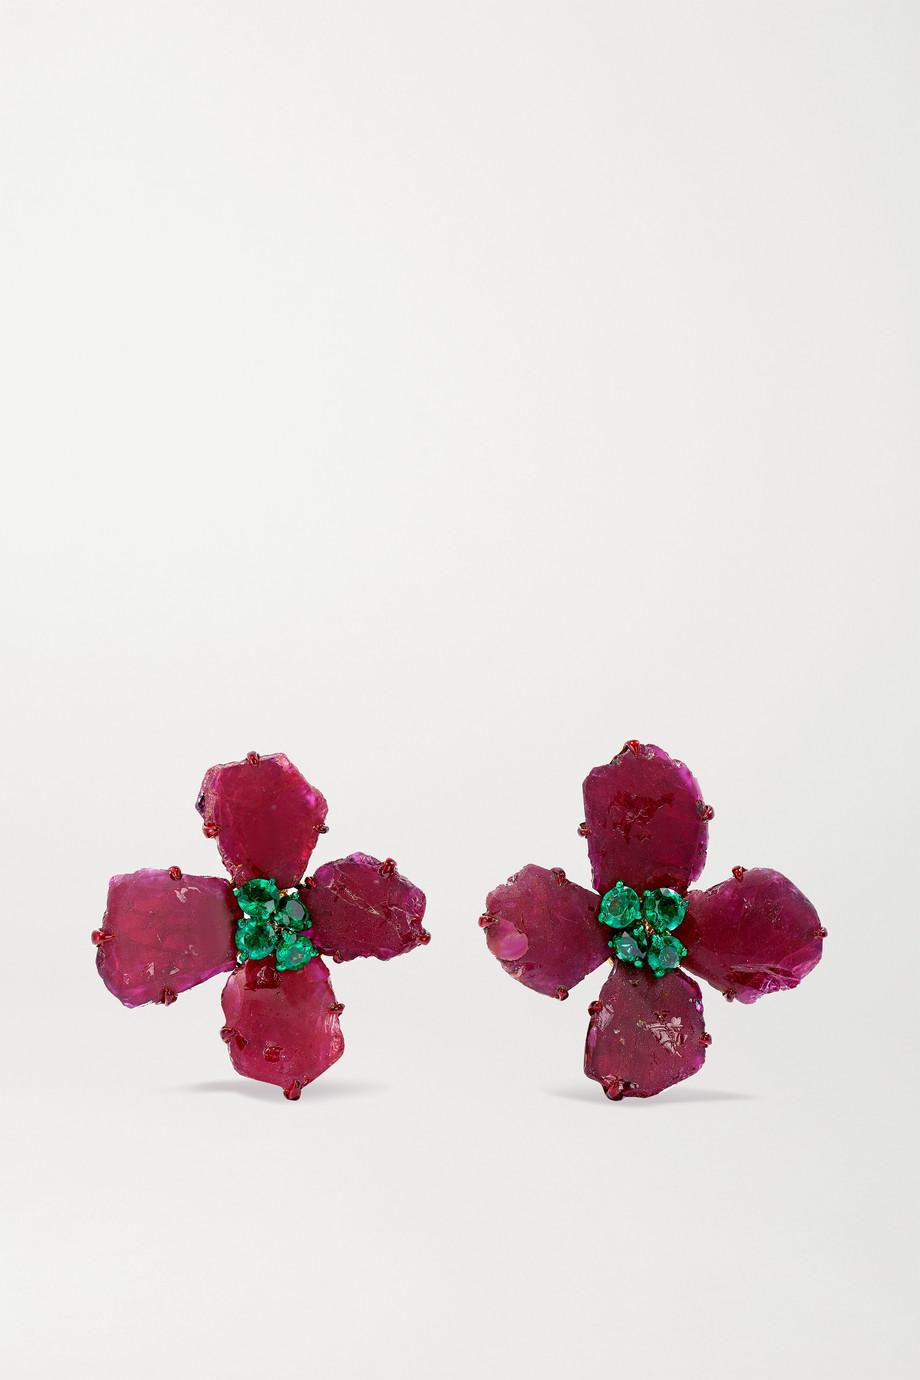 Bina Goenka Boucles d'oreilles en or 18 carats, rubis et émeraudes